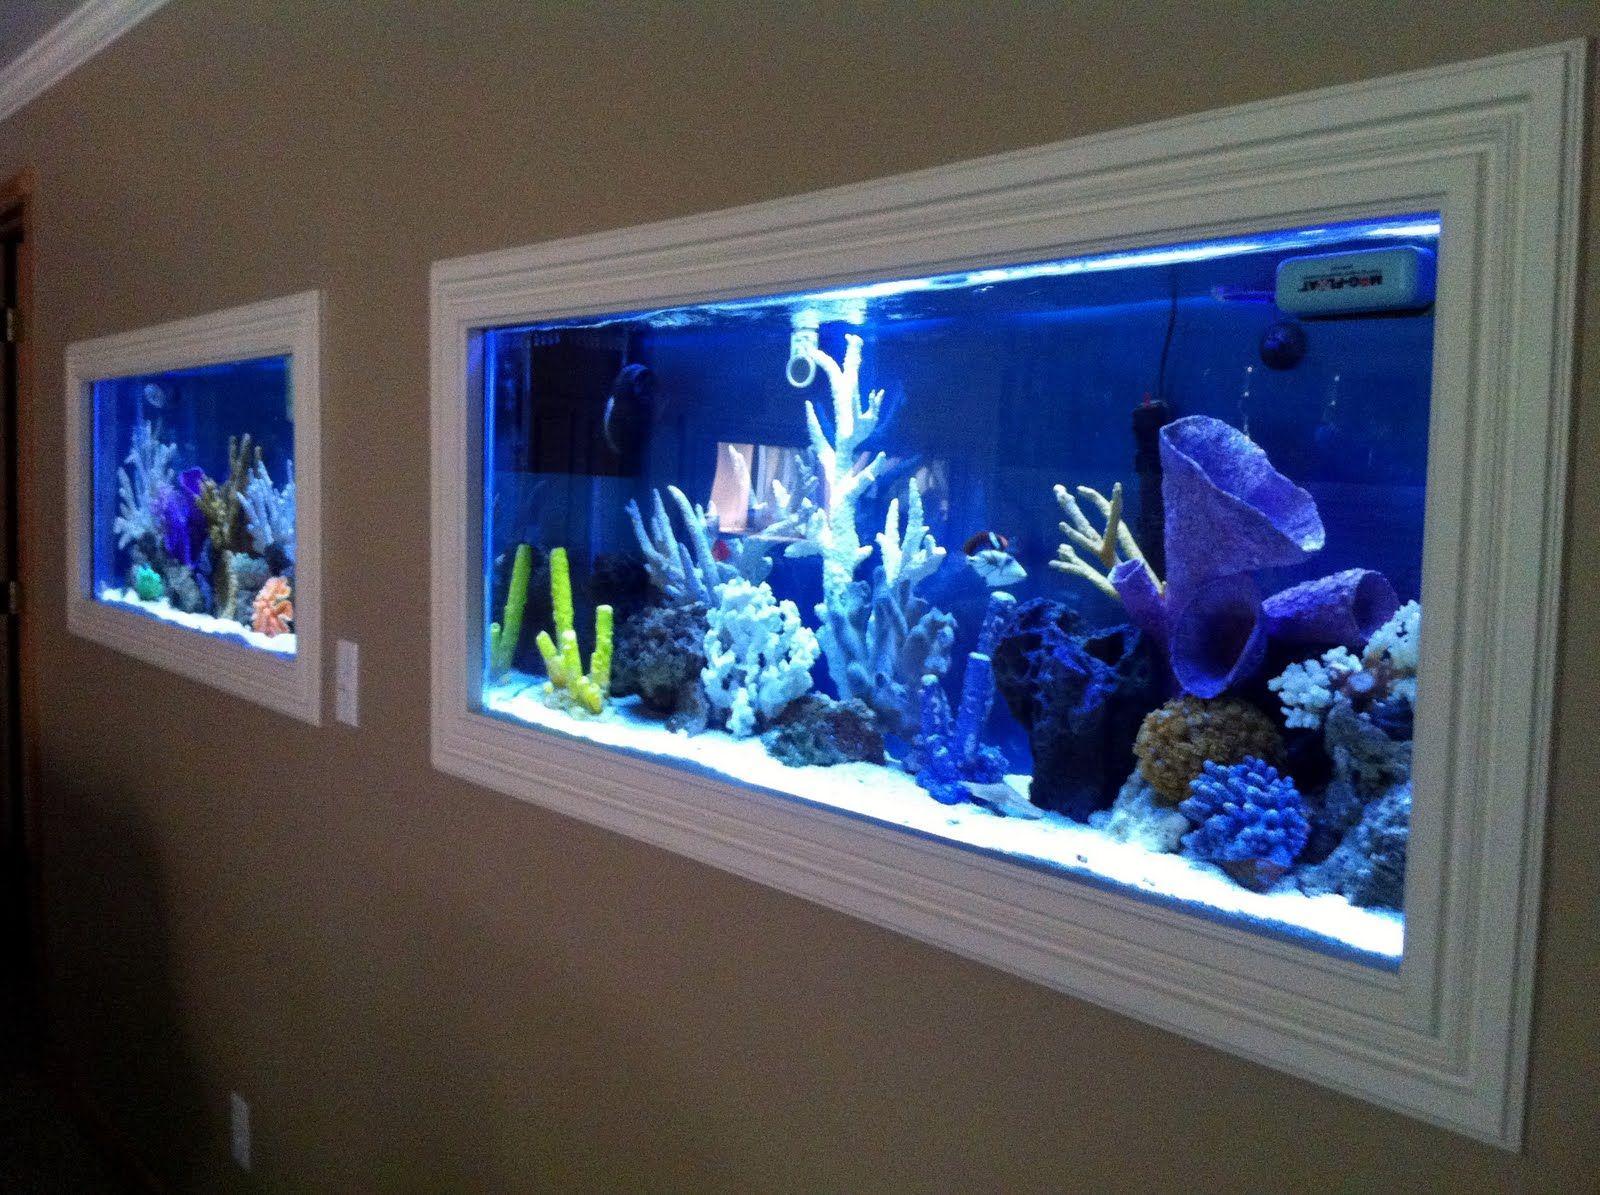 In Wall Aquarium Google Search Wall Aquarium Fish Tank Design